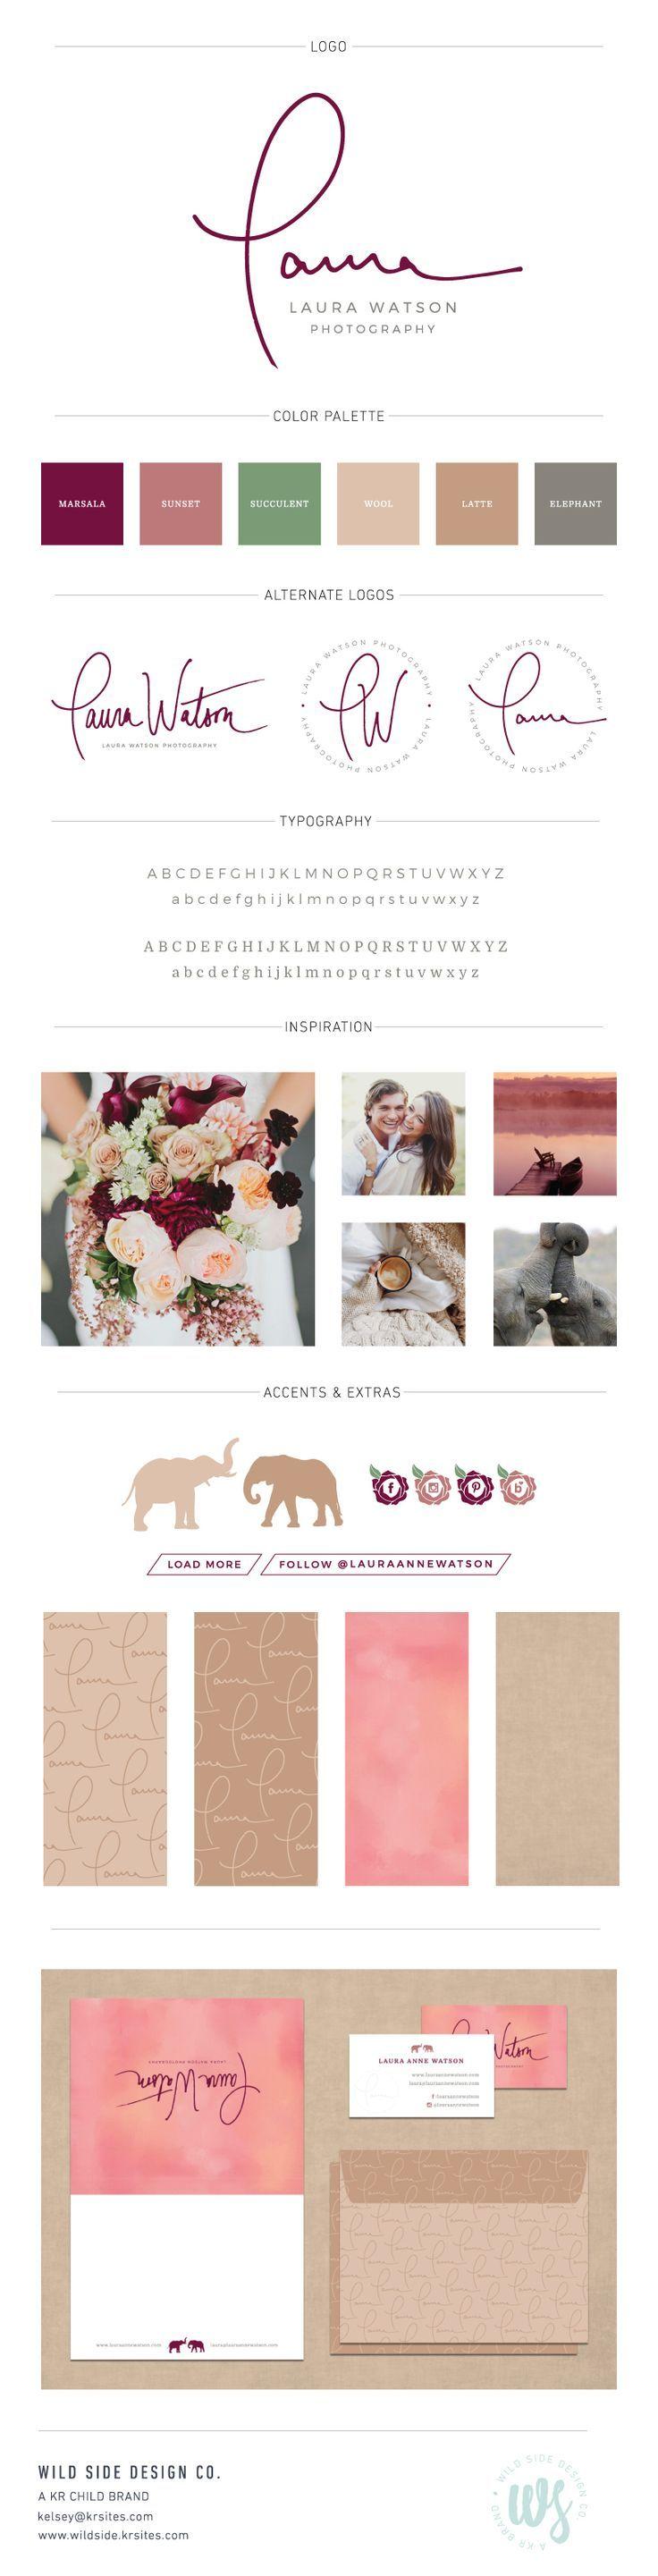 Brand Launch | Brand Style Board | Wedding and Lifestyle Photographer Branding | Laura Watson Photography Brand Design by Wild Side Design Co. | #branding www.wildside.krsites.com